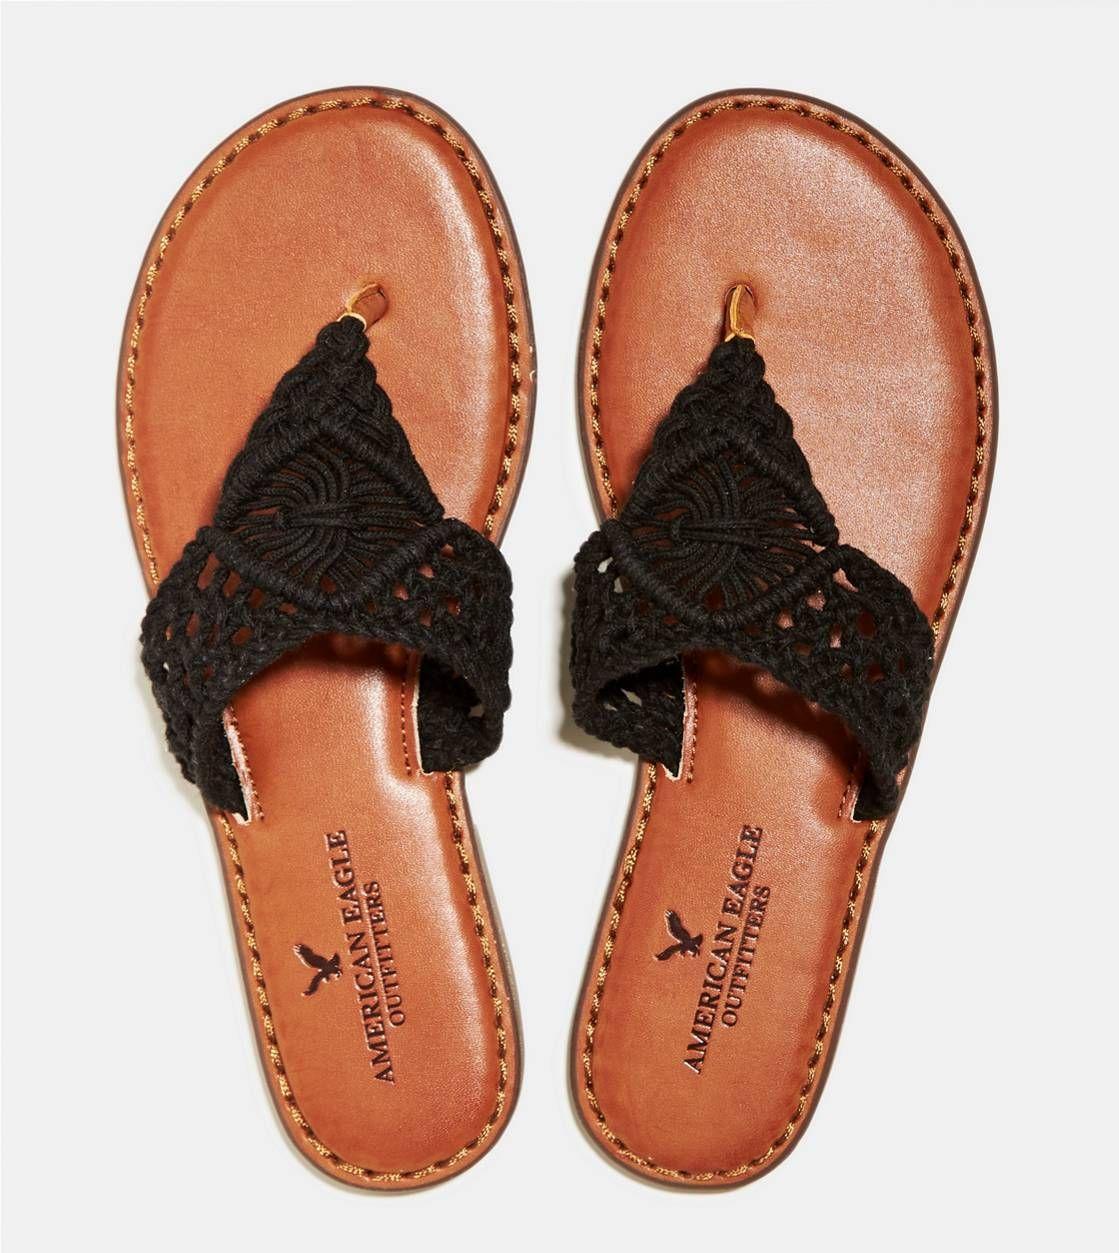 Black Aeo Macrame Thong Sandal American Eagle Outfitters